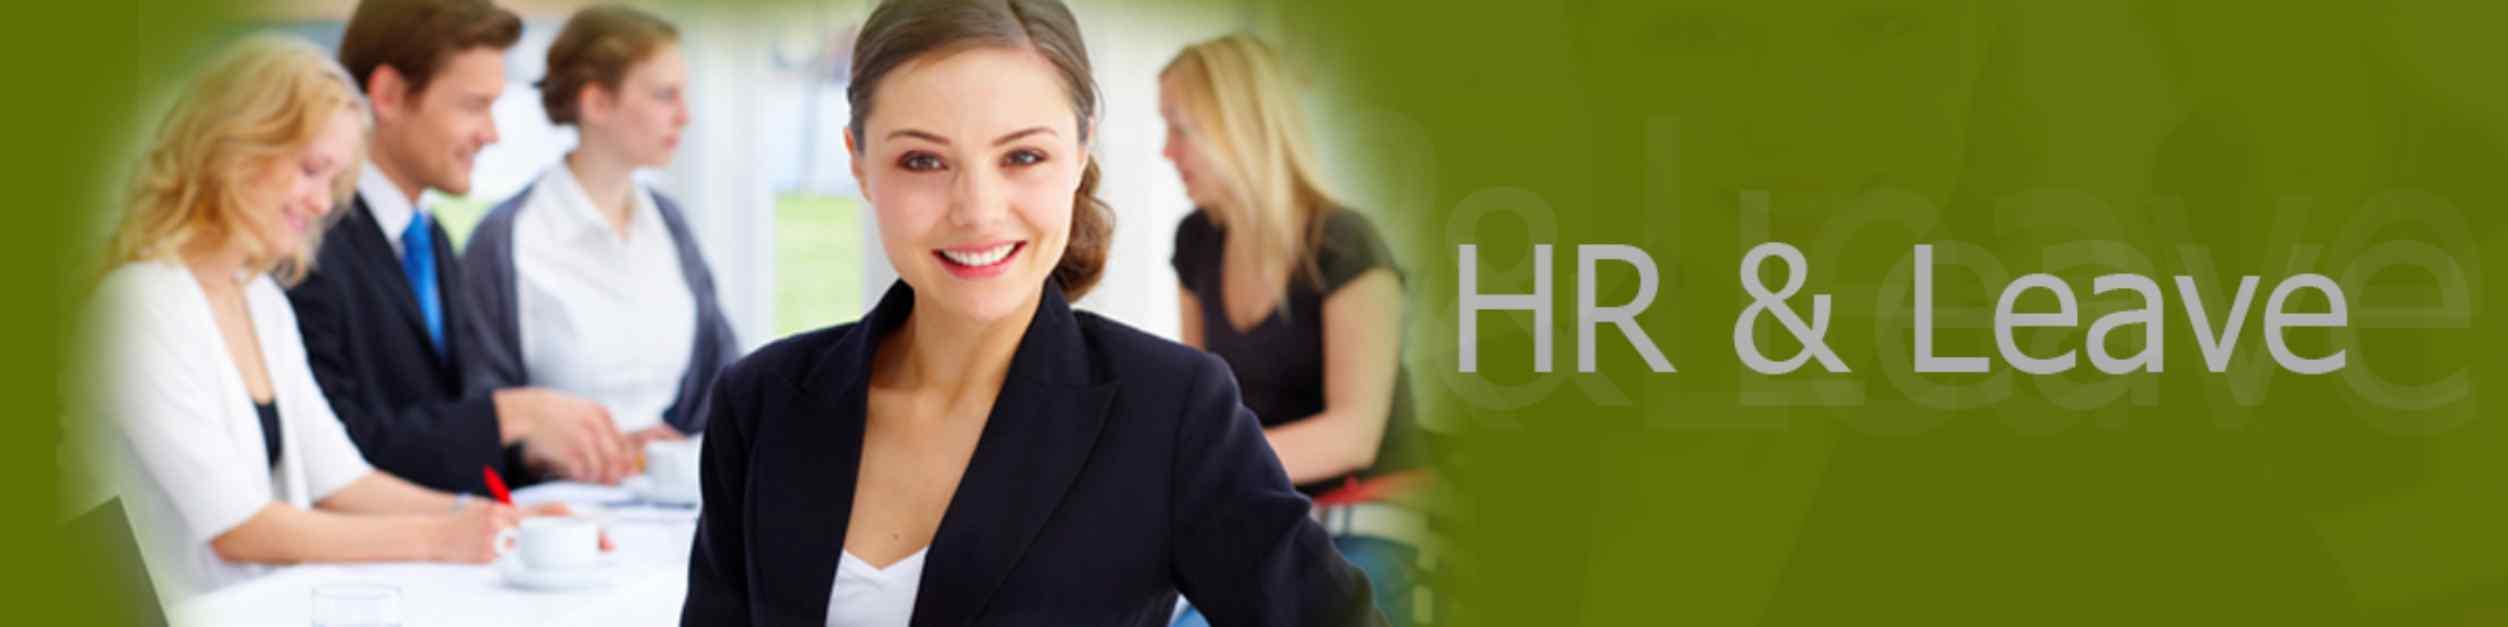 HR & Leave